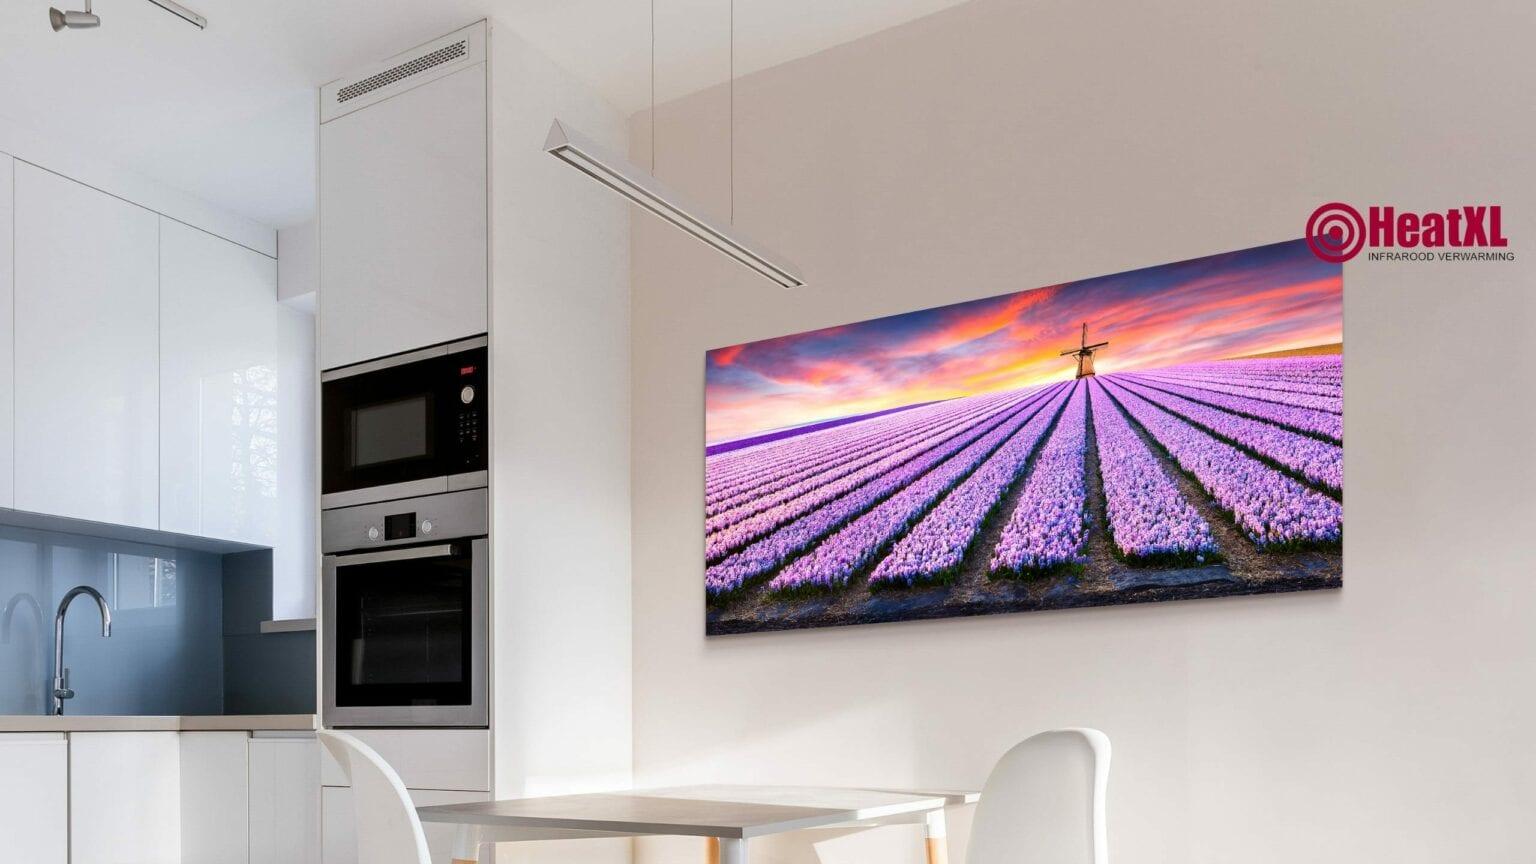 design verwarming infrarood panelen warmte